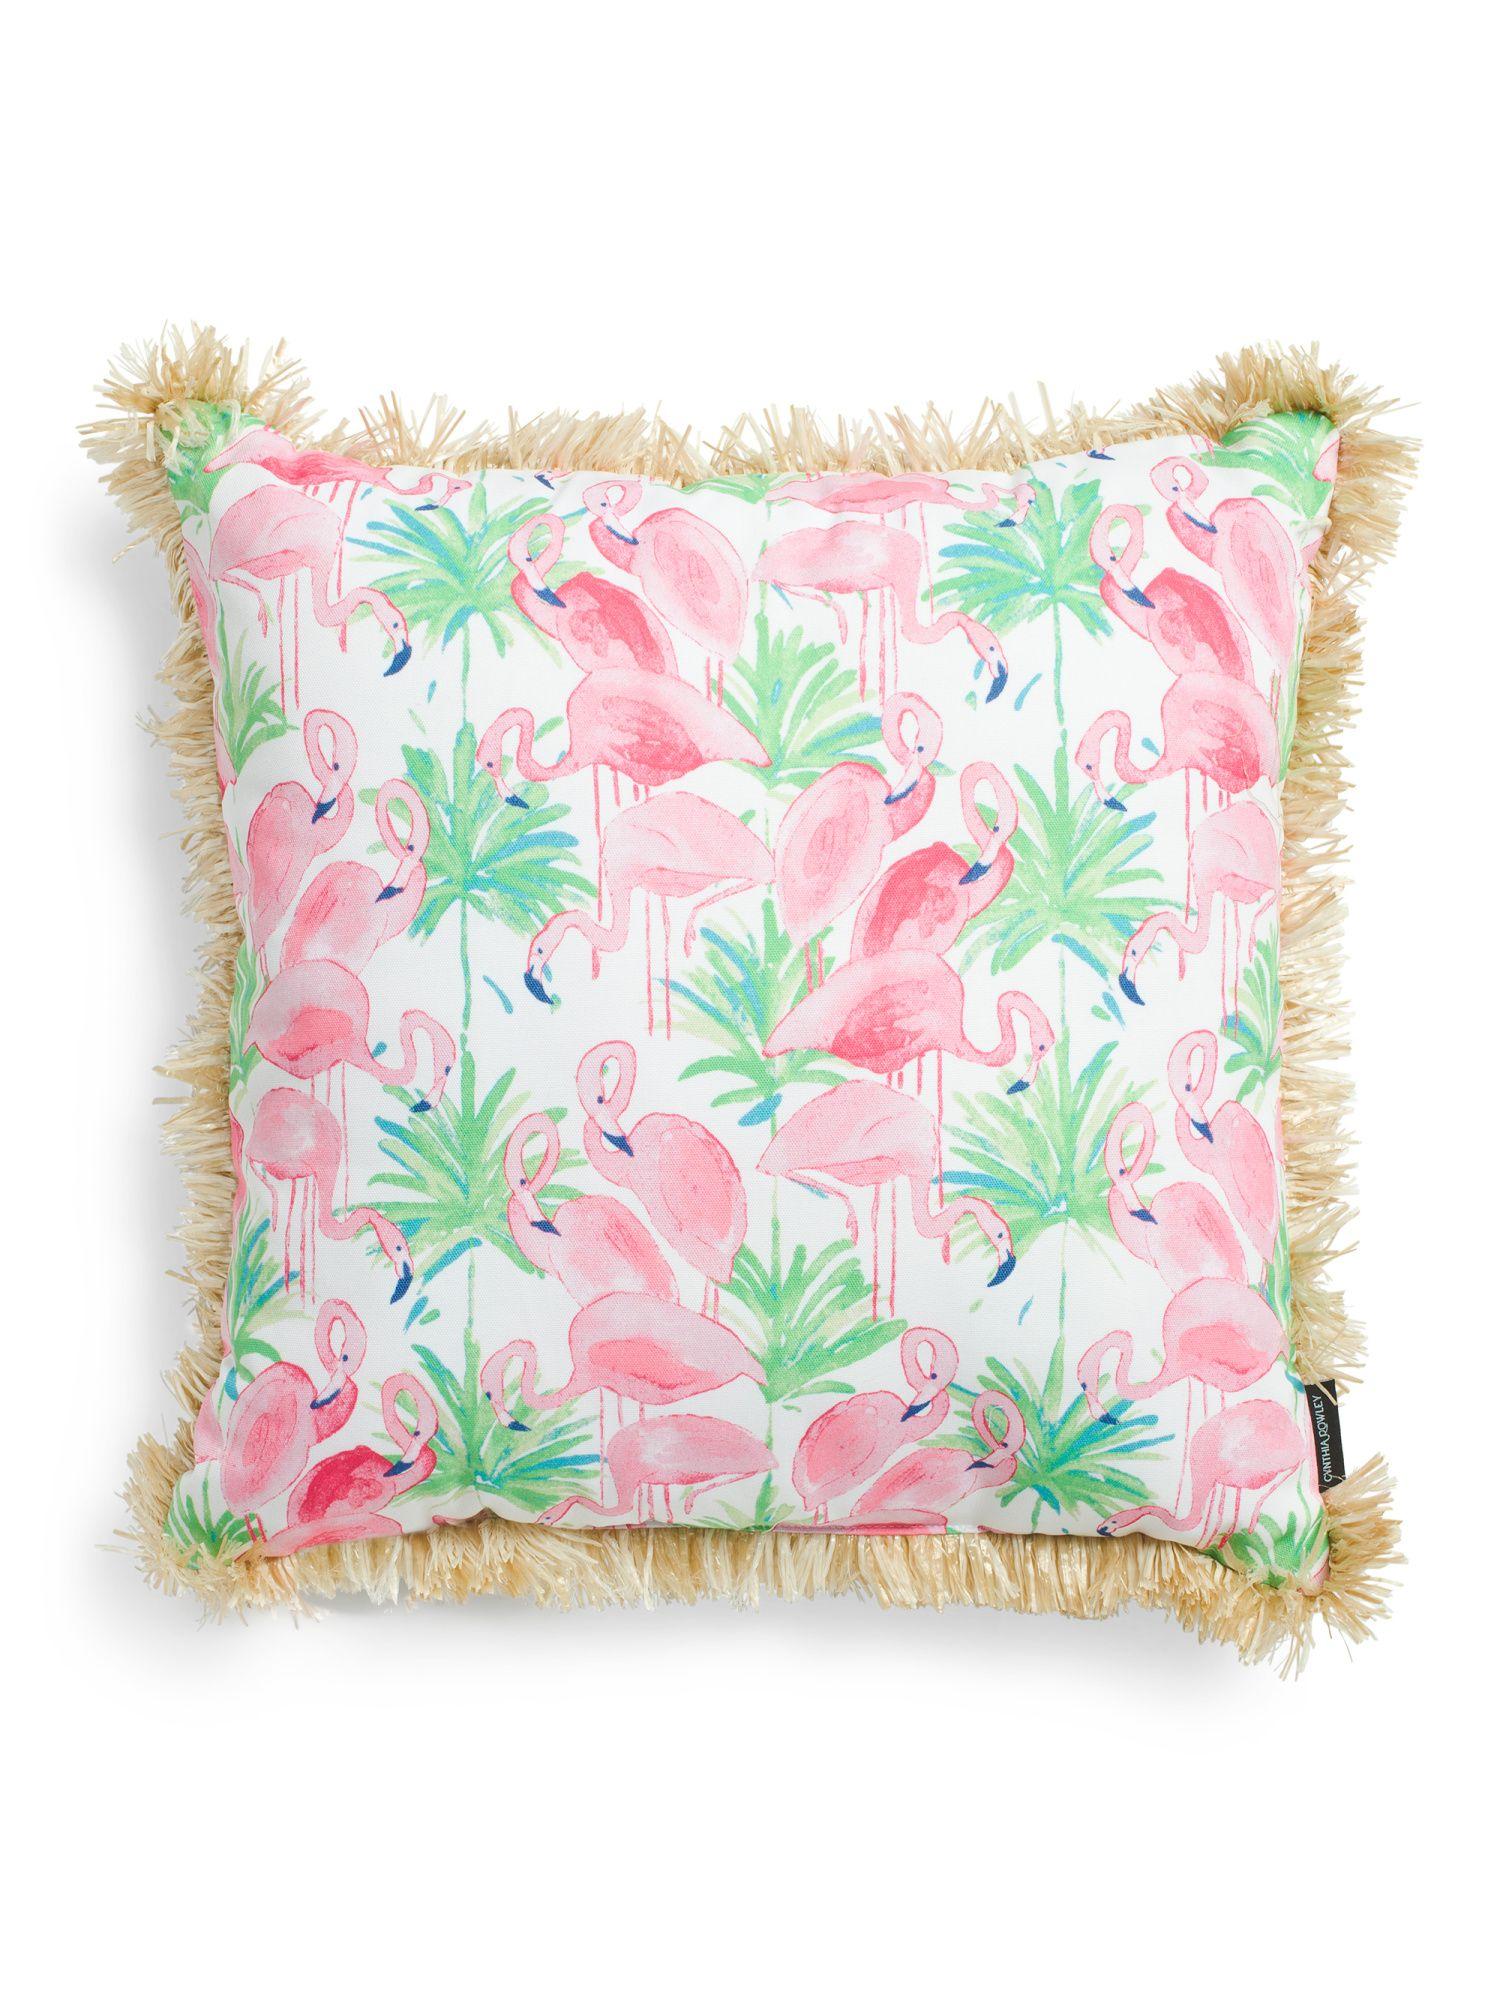 20x20 Indoor Outdoor Flamingo Pillow Throw Pillows T J Maxx Throw Pillows Pillows Tj Maxx